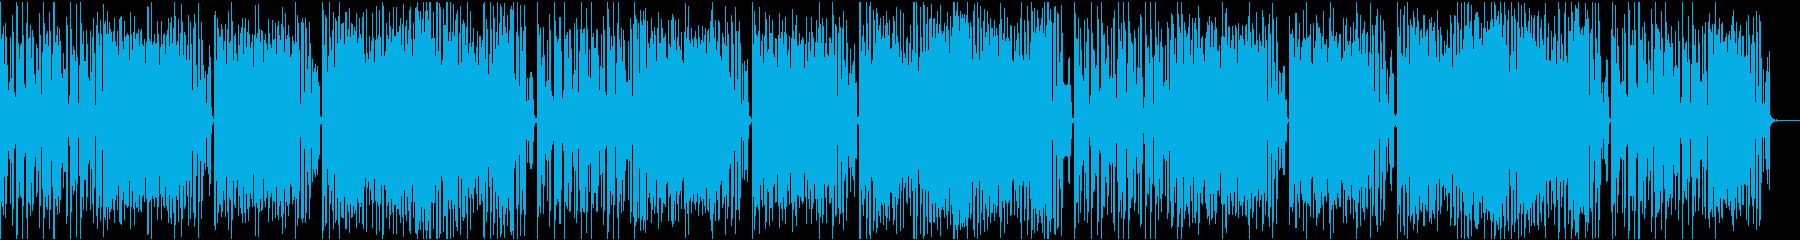 Light, fun, comical's reproduced waveform